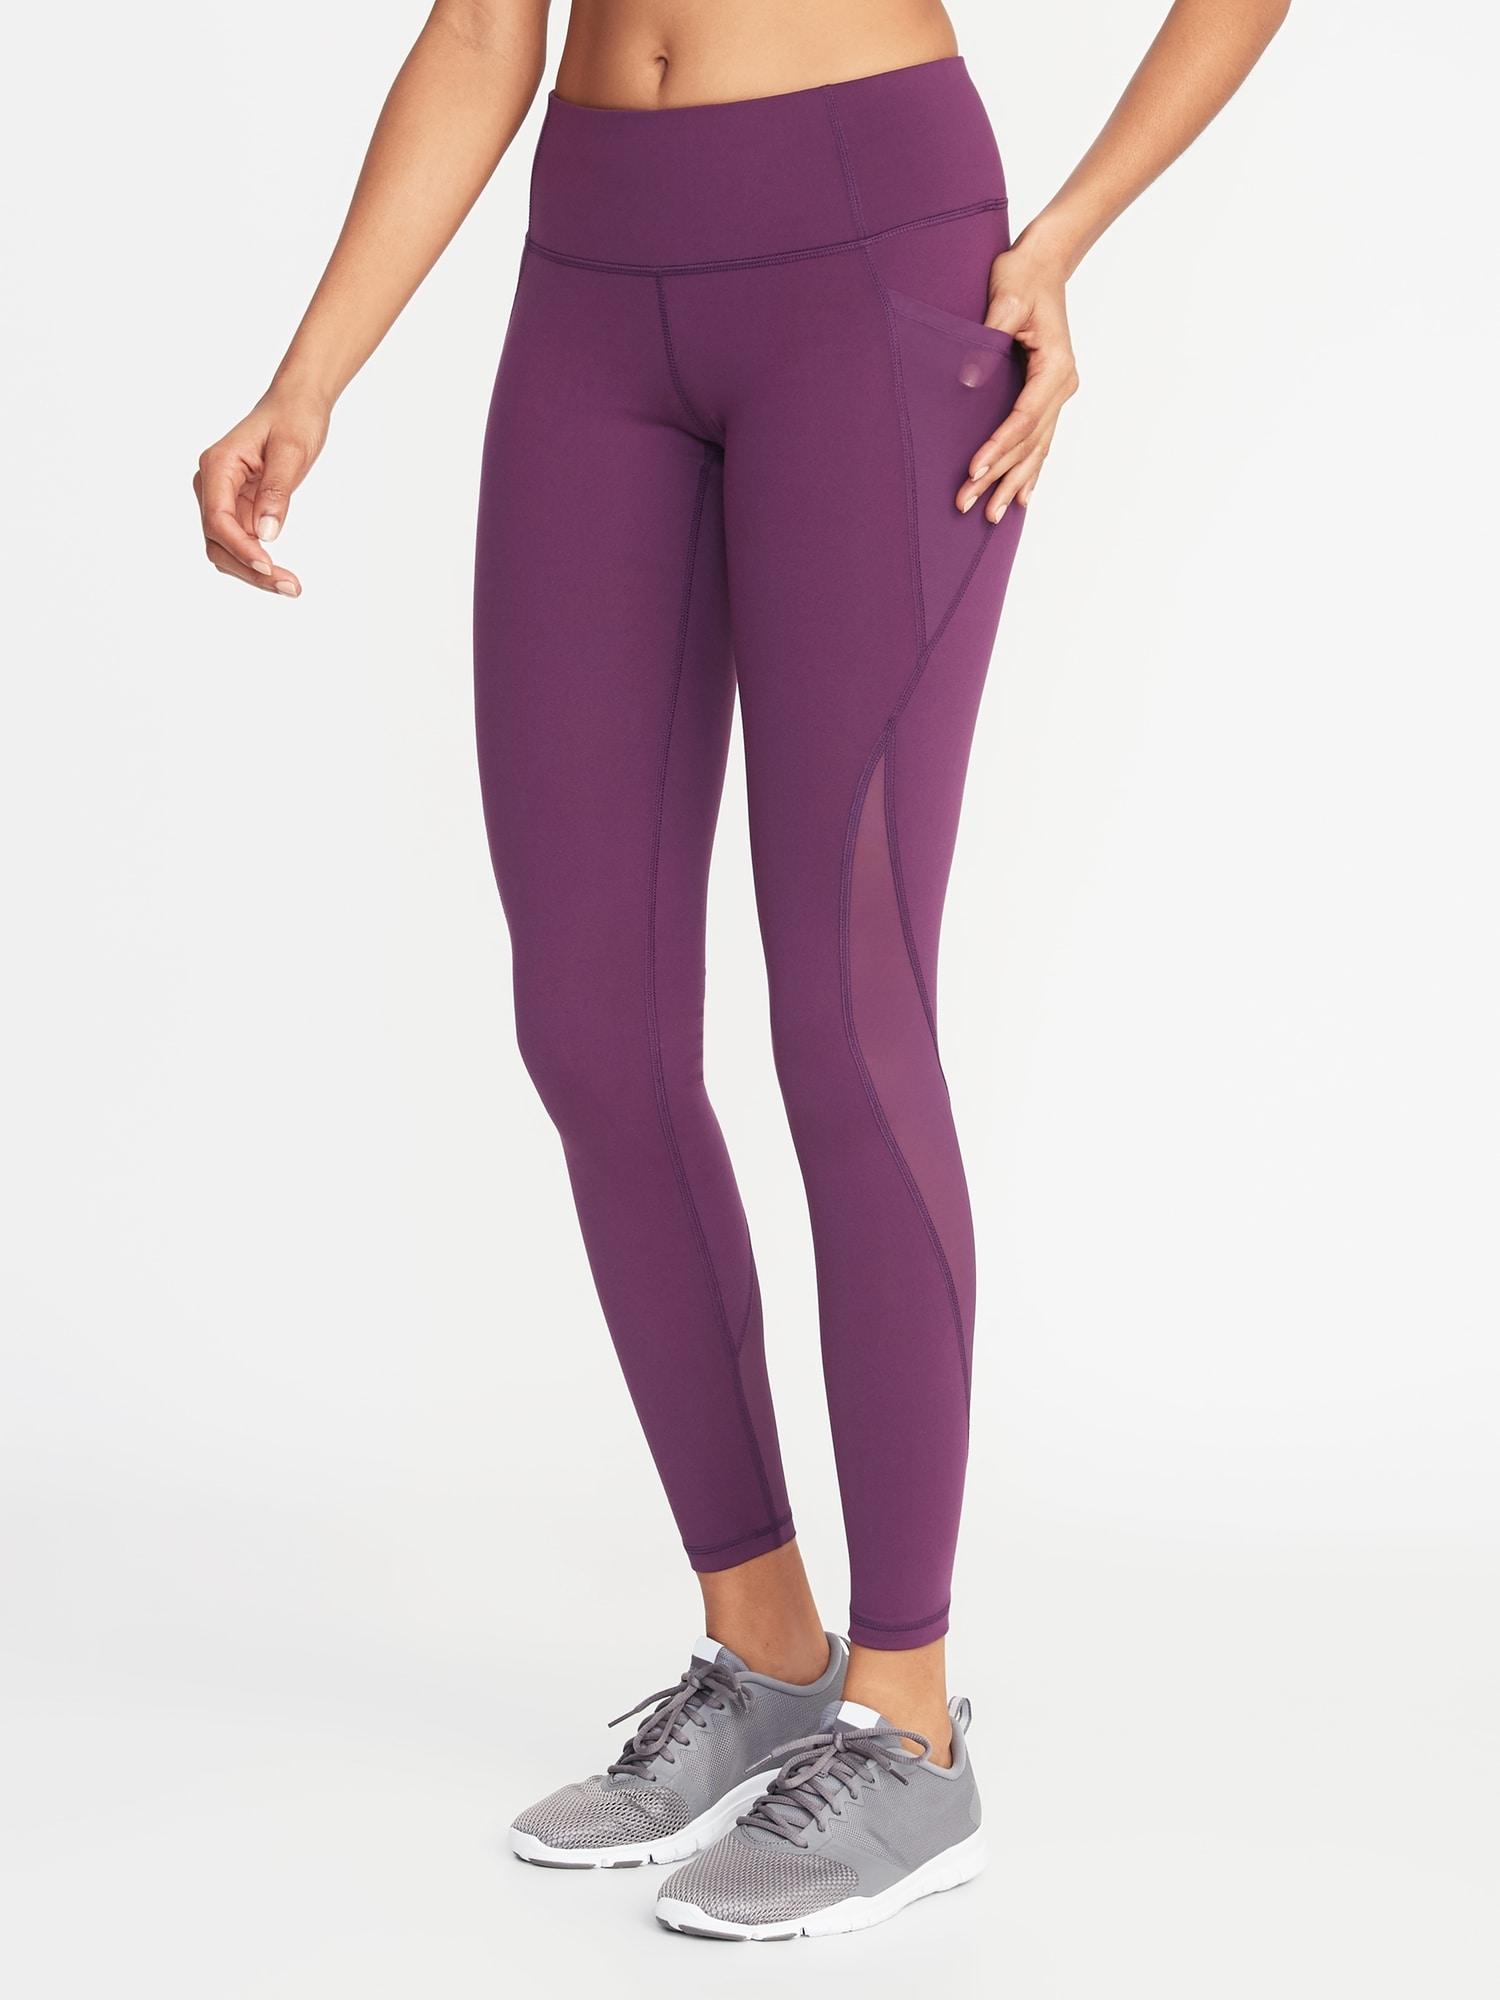 4b7407a6027963 Mid-Rise Elevate Side-Pocket Mesh-Trim Compression Leggings for Women